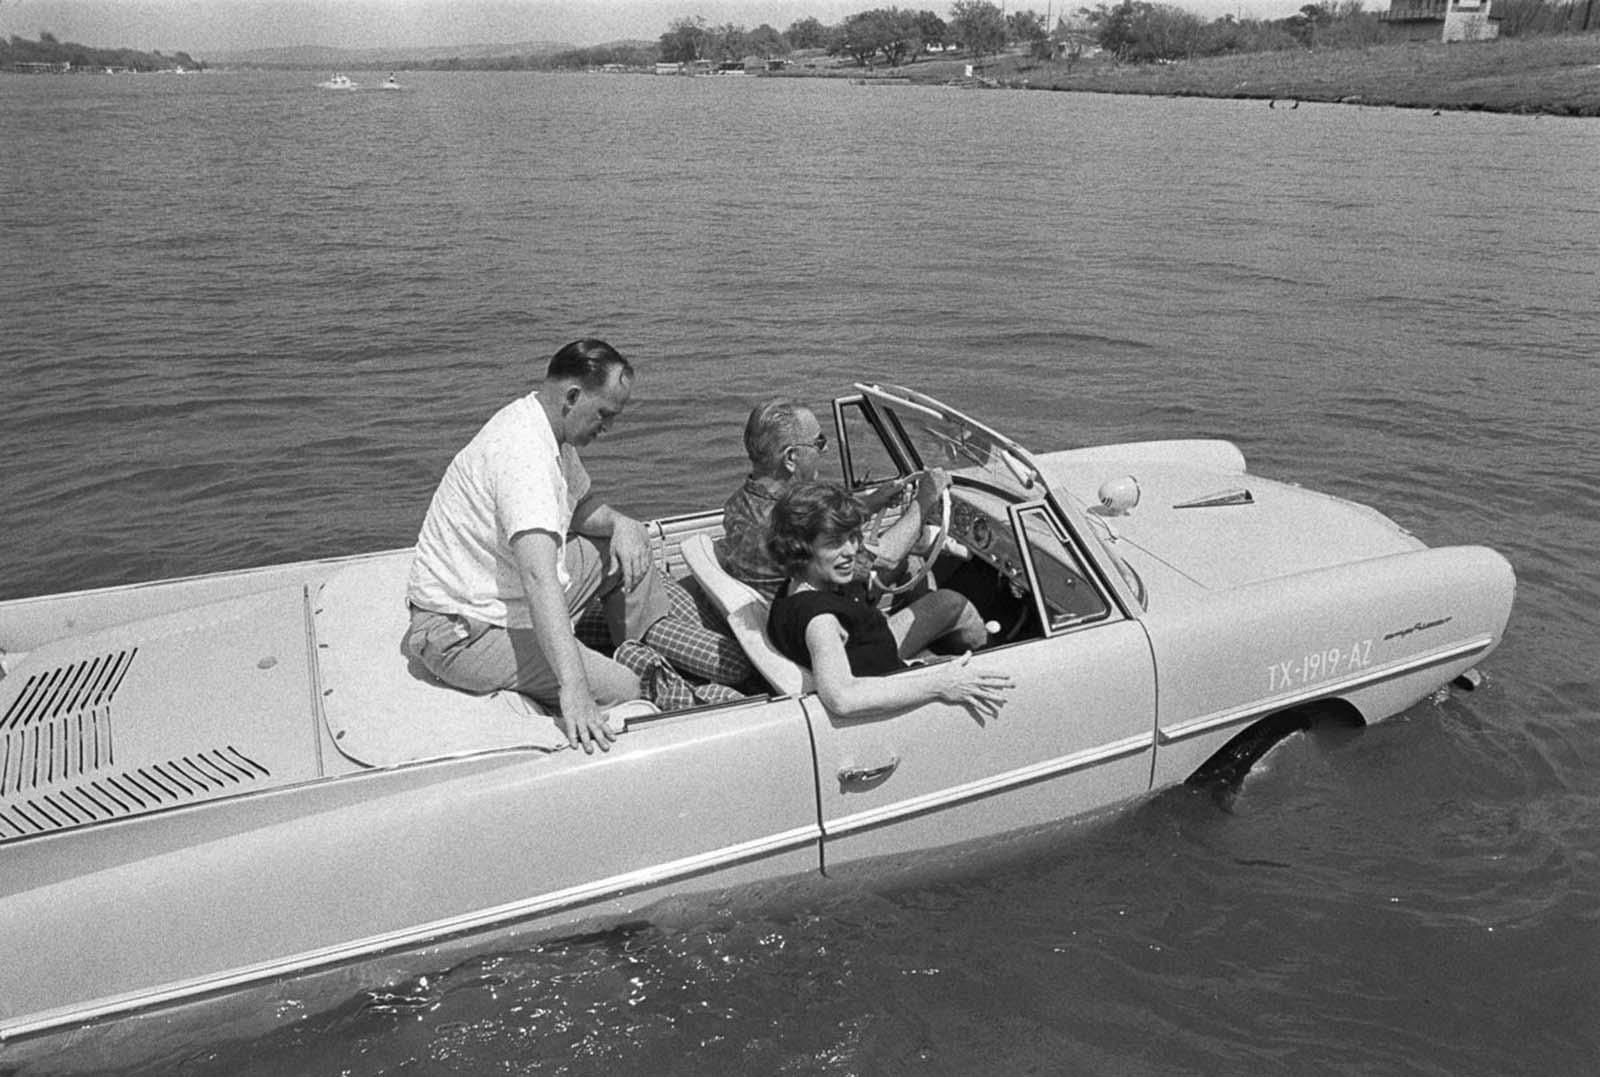 President Lyndon Johnson drives an Amphicar at his Texas ranch. 1965.